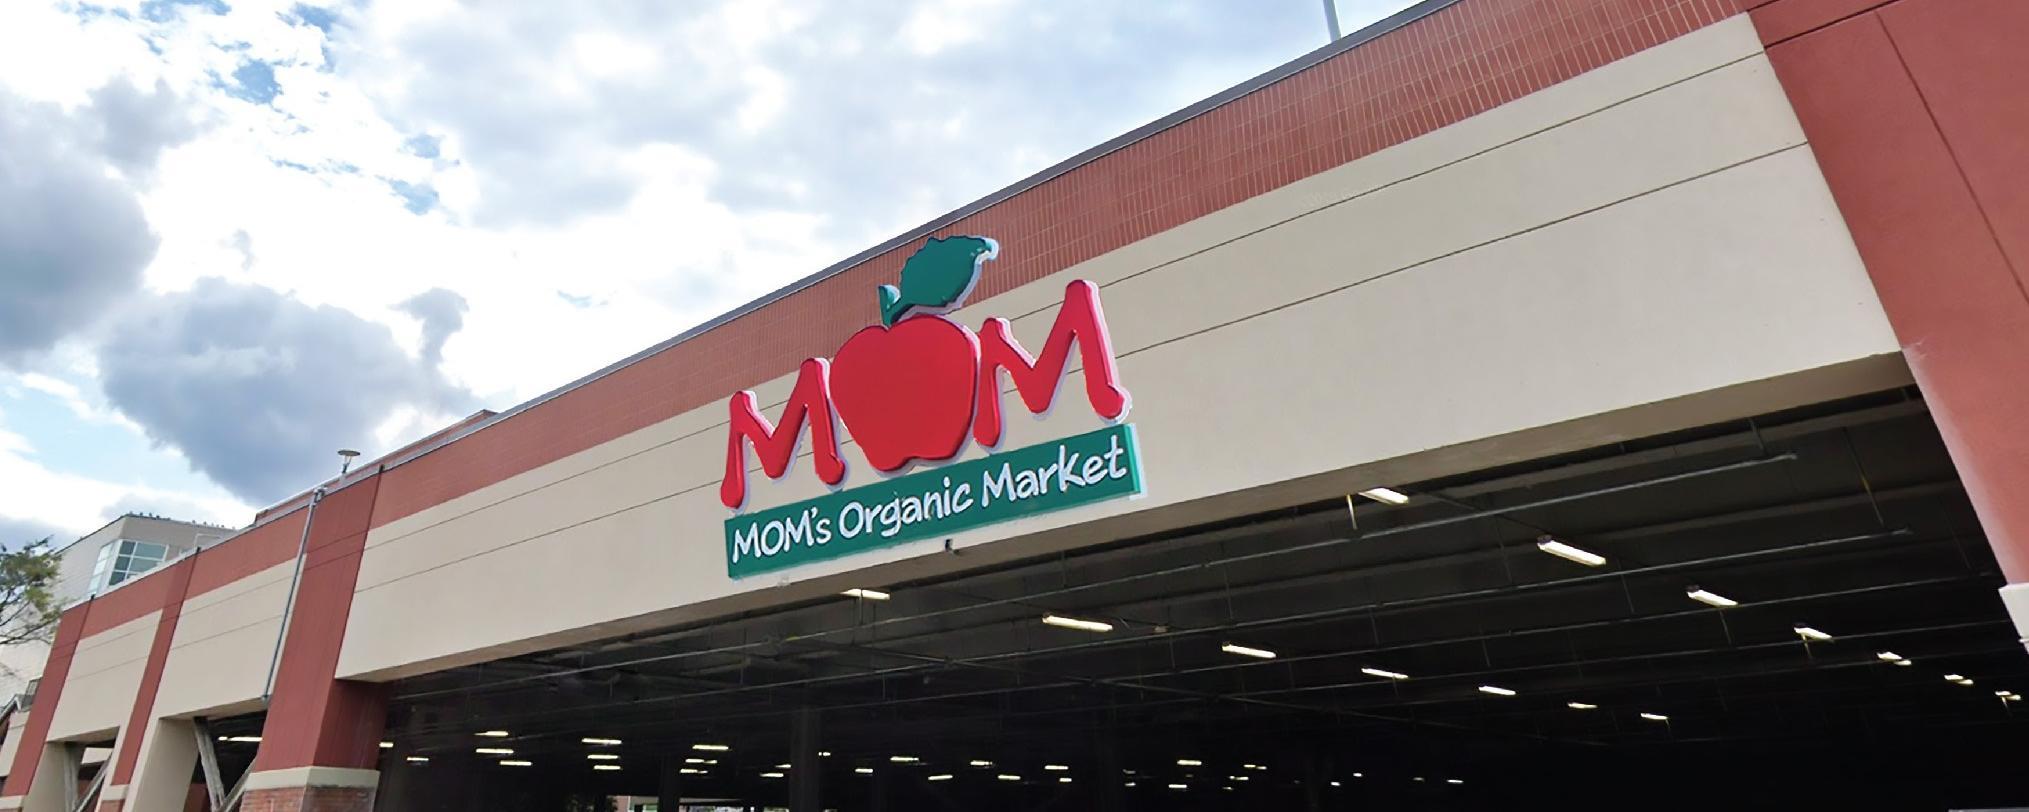 MOM's Organic Market Dobbs Ferry Brand Cover